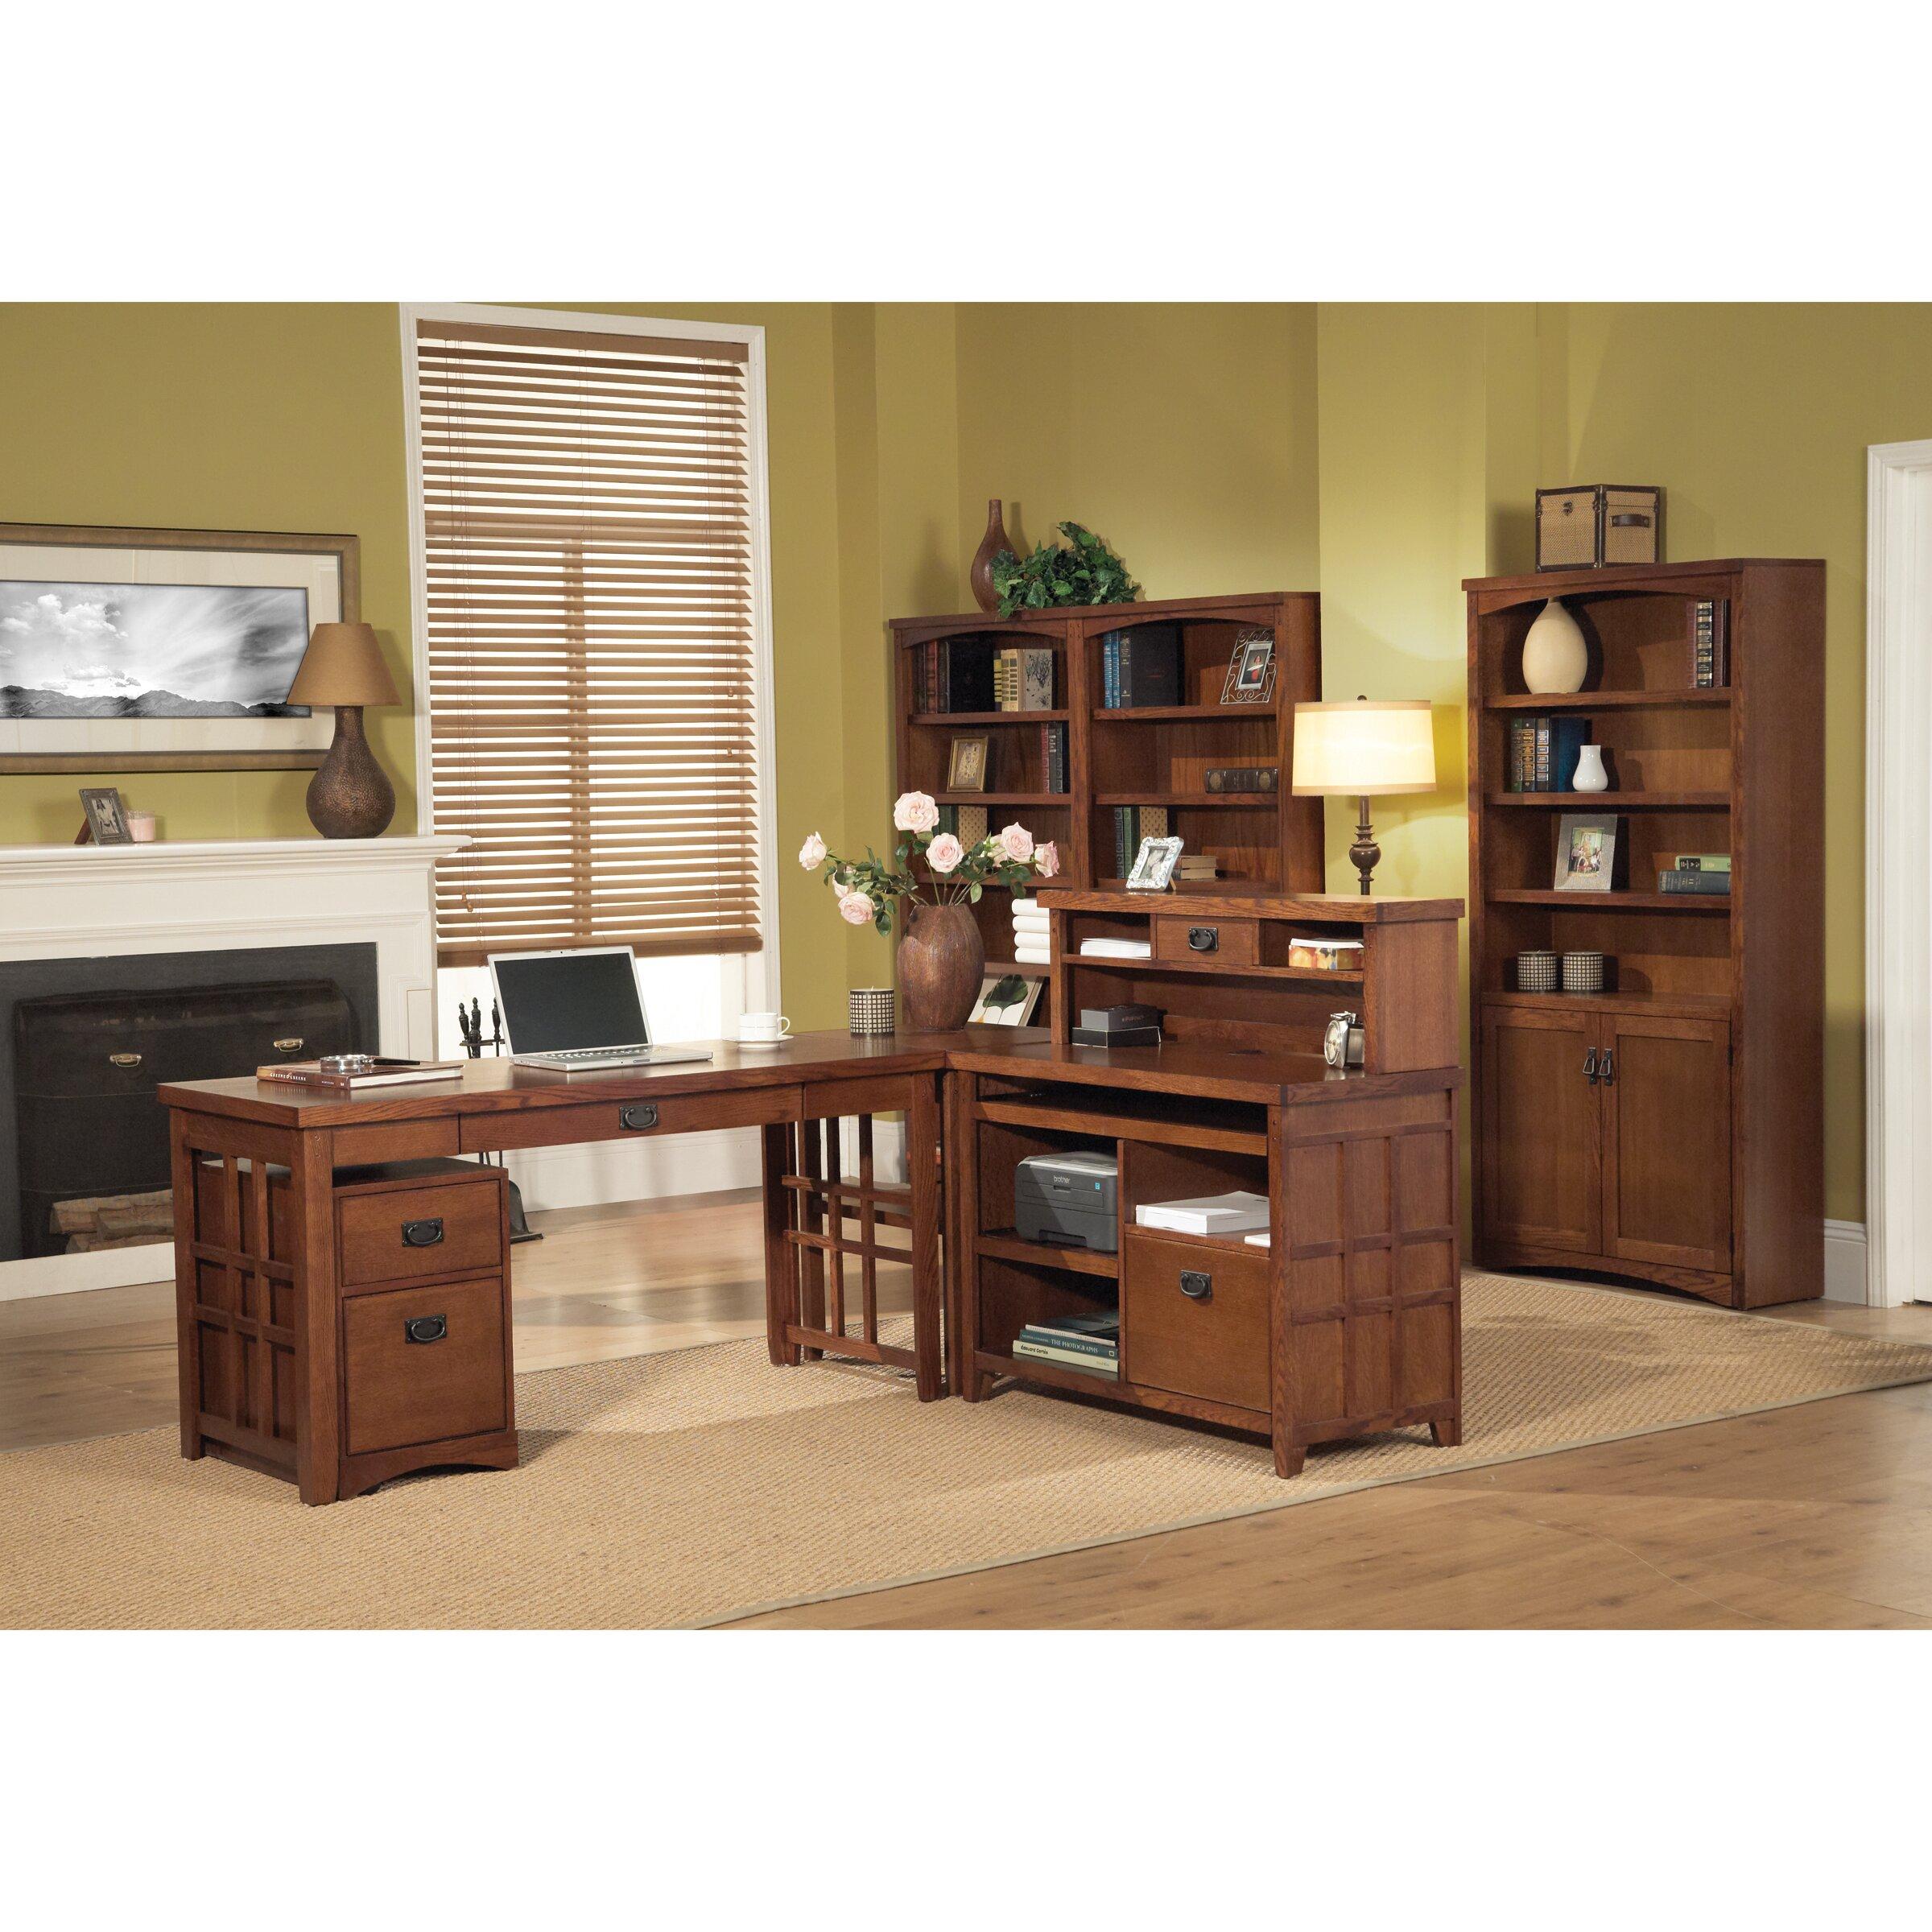 Kathy Ireland Living Room Furniture Kathy Ireland Home By Martin Furniture Mission Pasadena Credenza